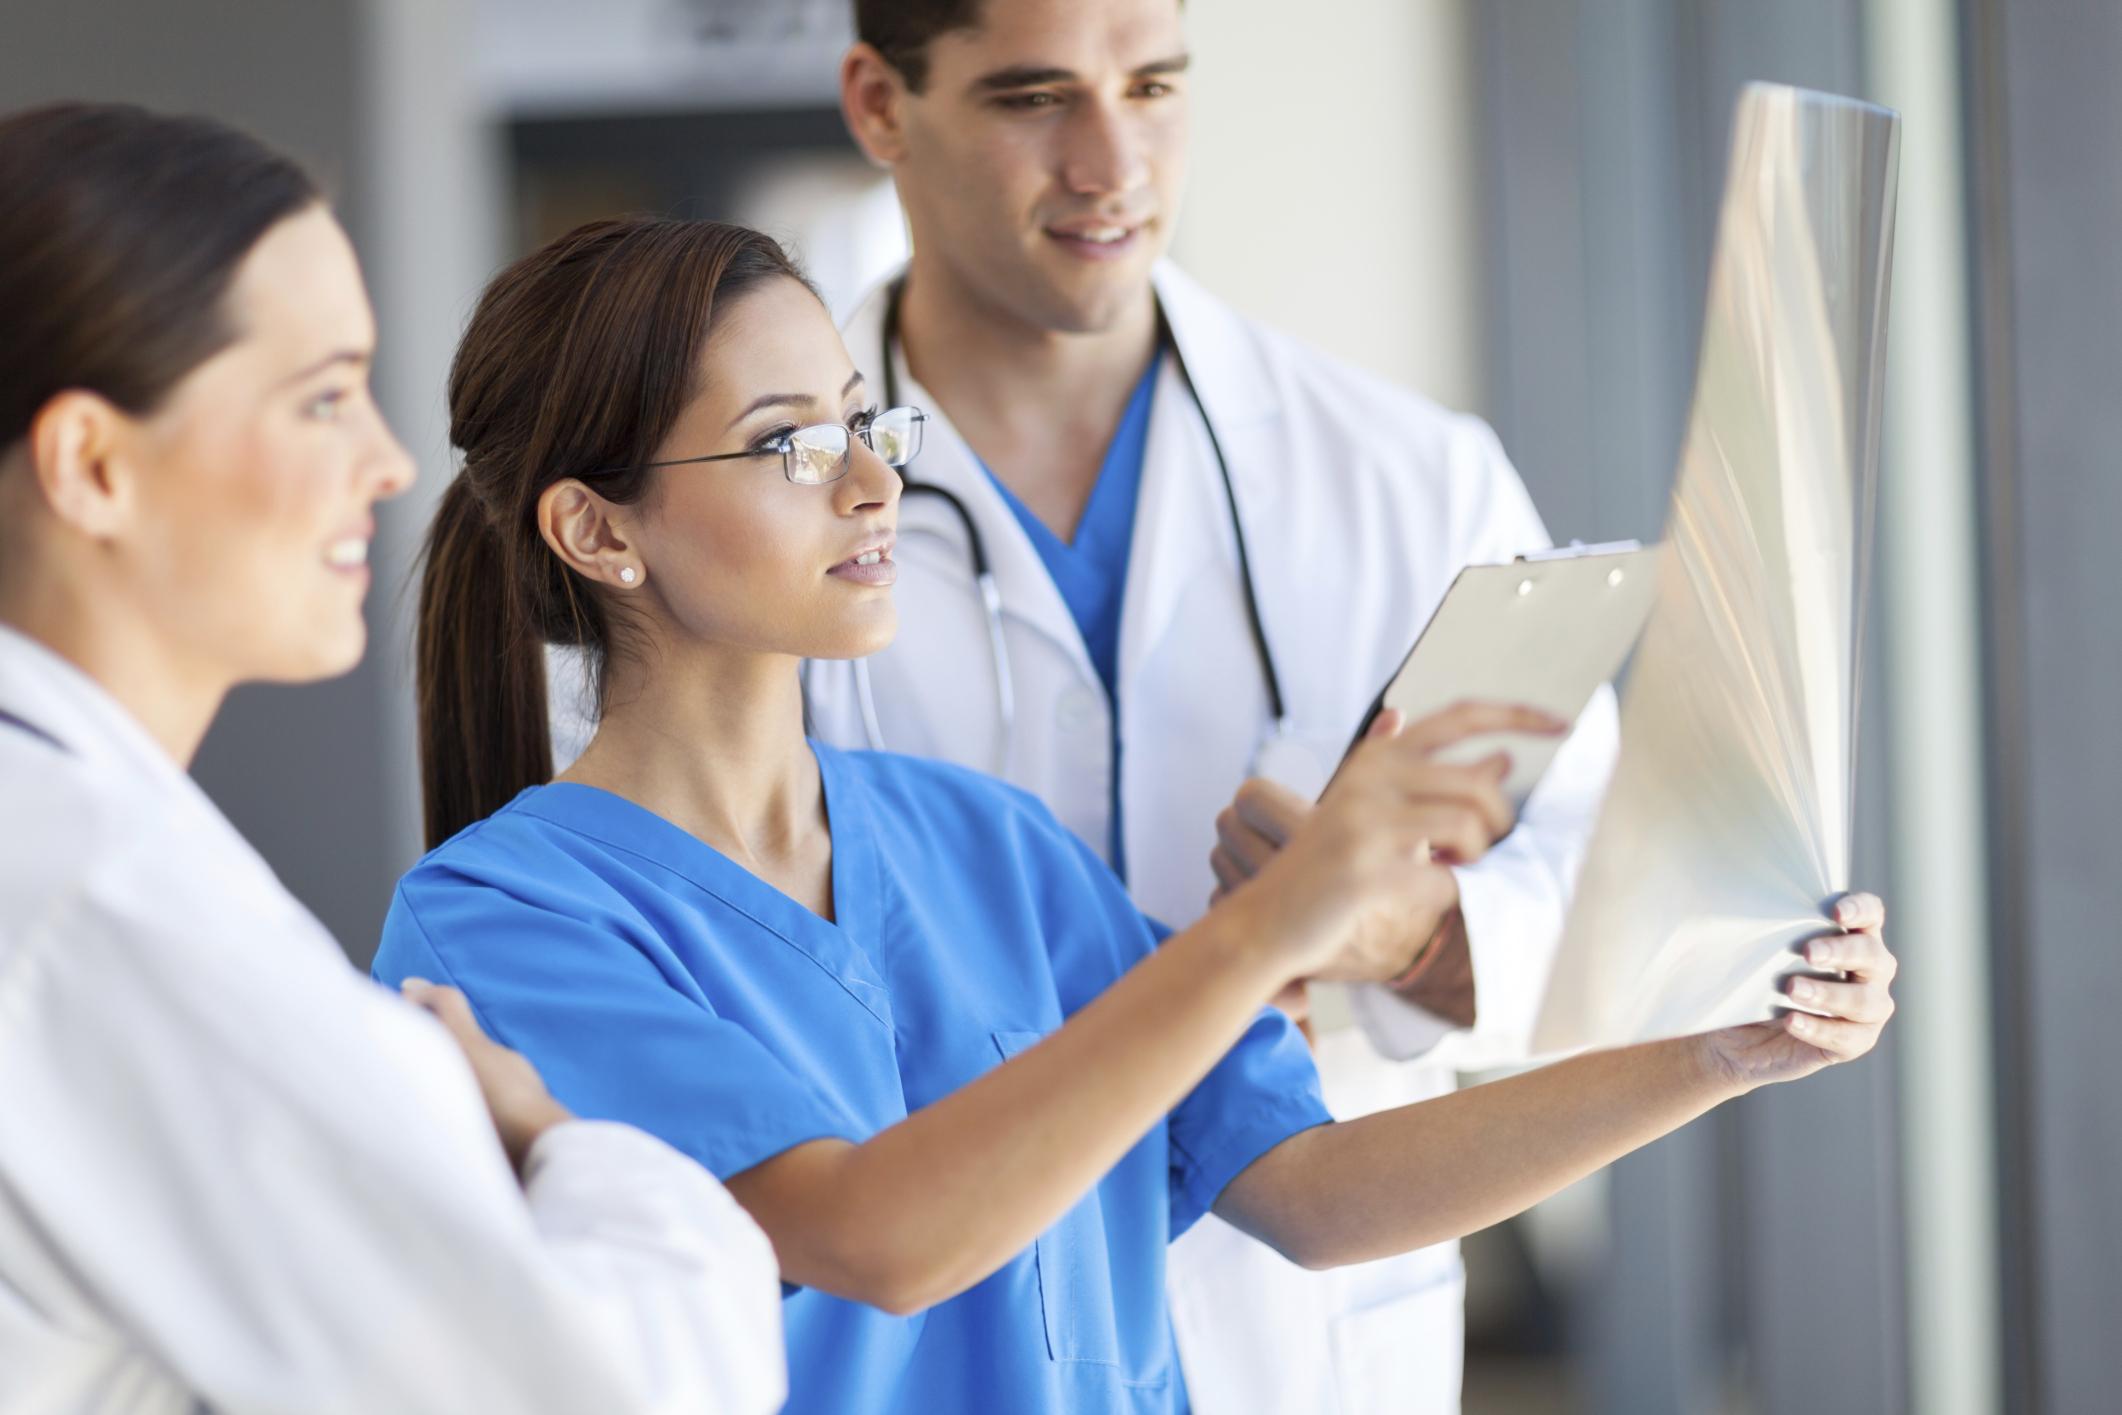 Терапевт. Фото: healthcarelawinsights.com